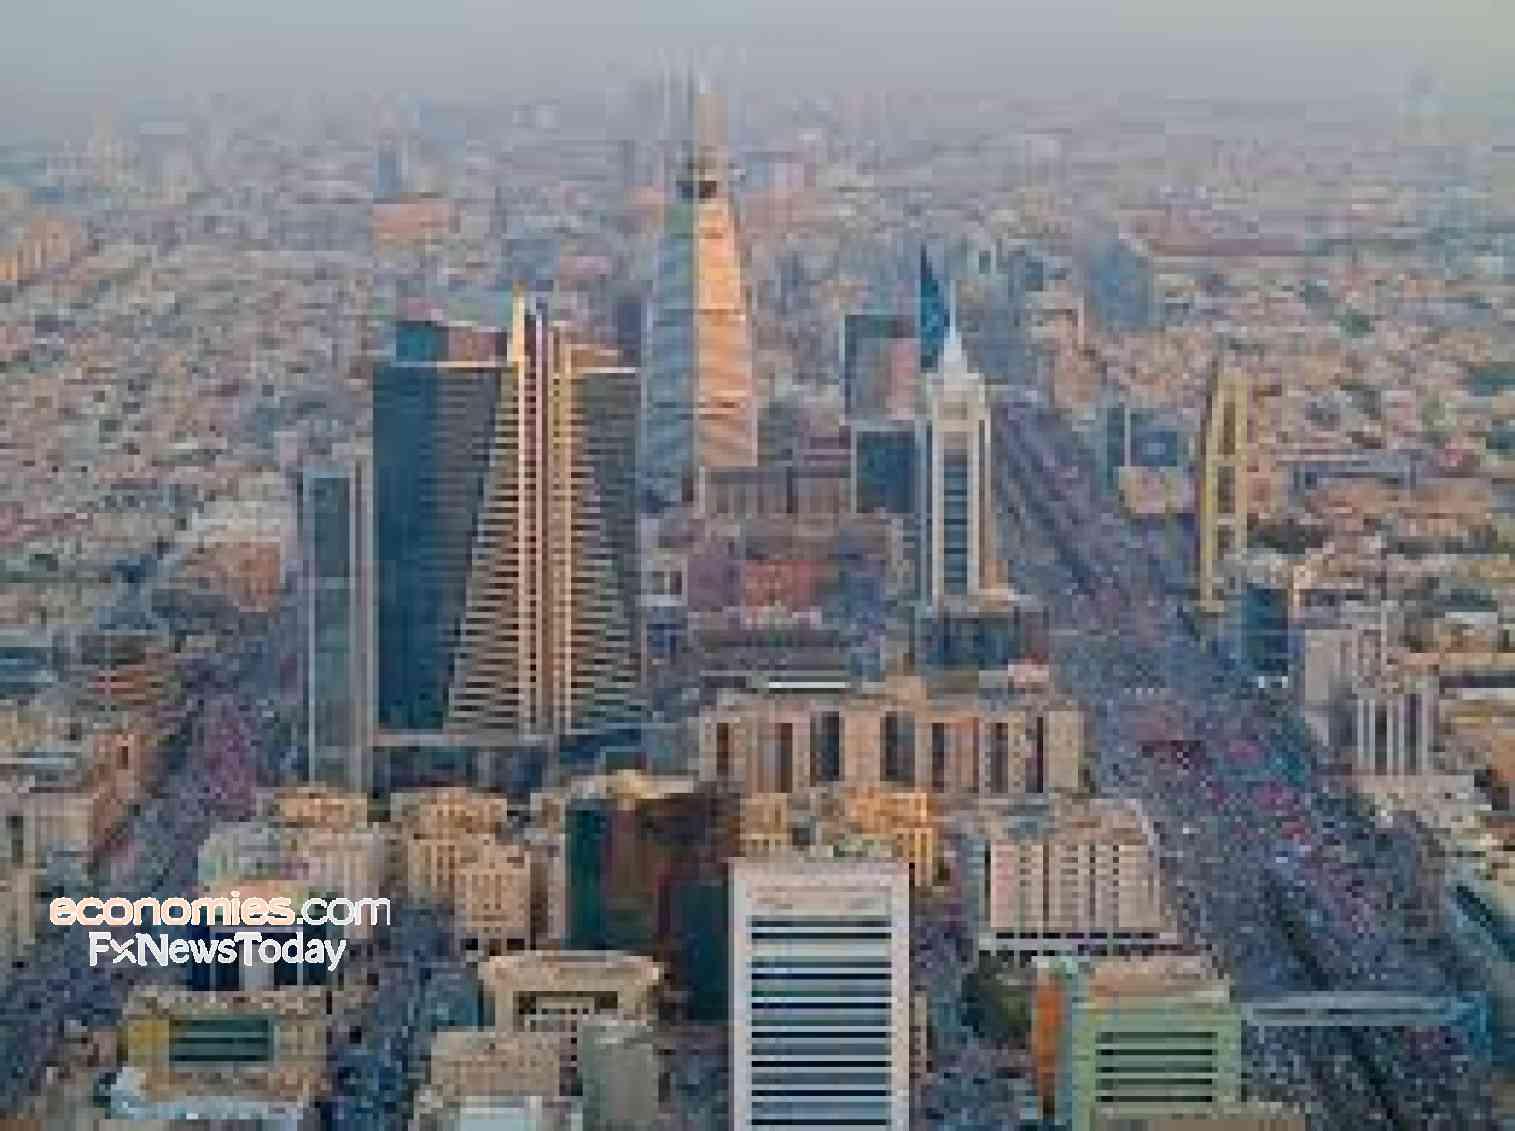 Arriyadh Development FY18 profit slips 8% on lower revenues